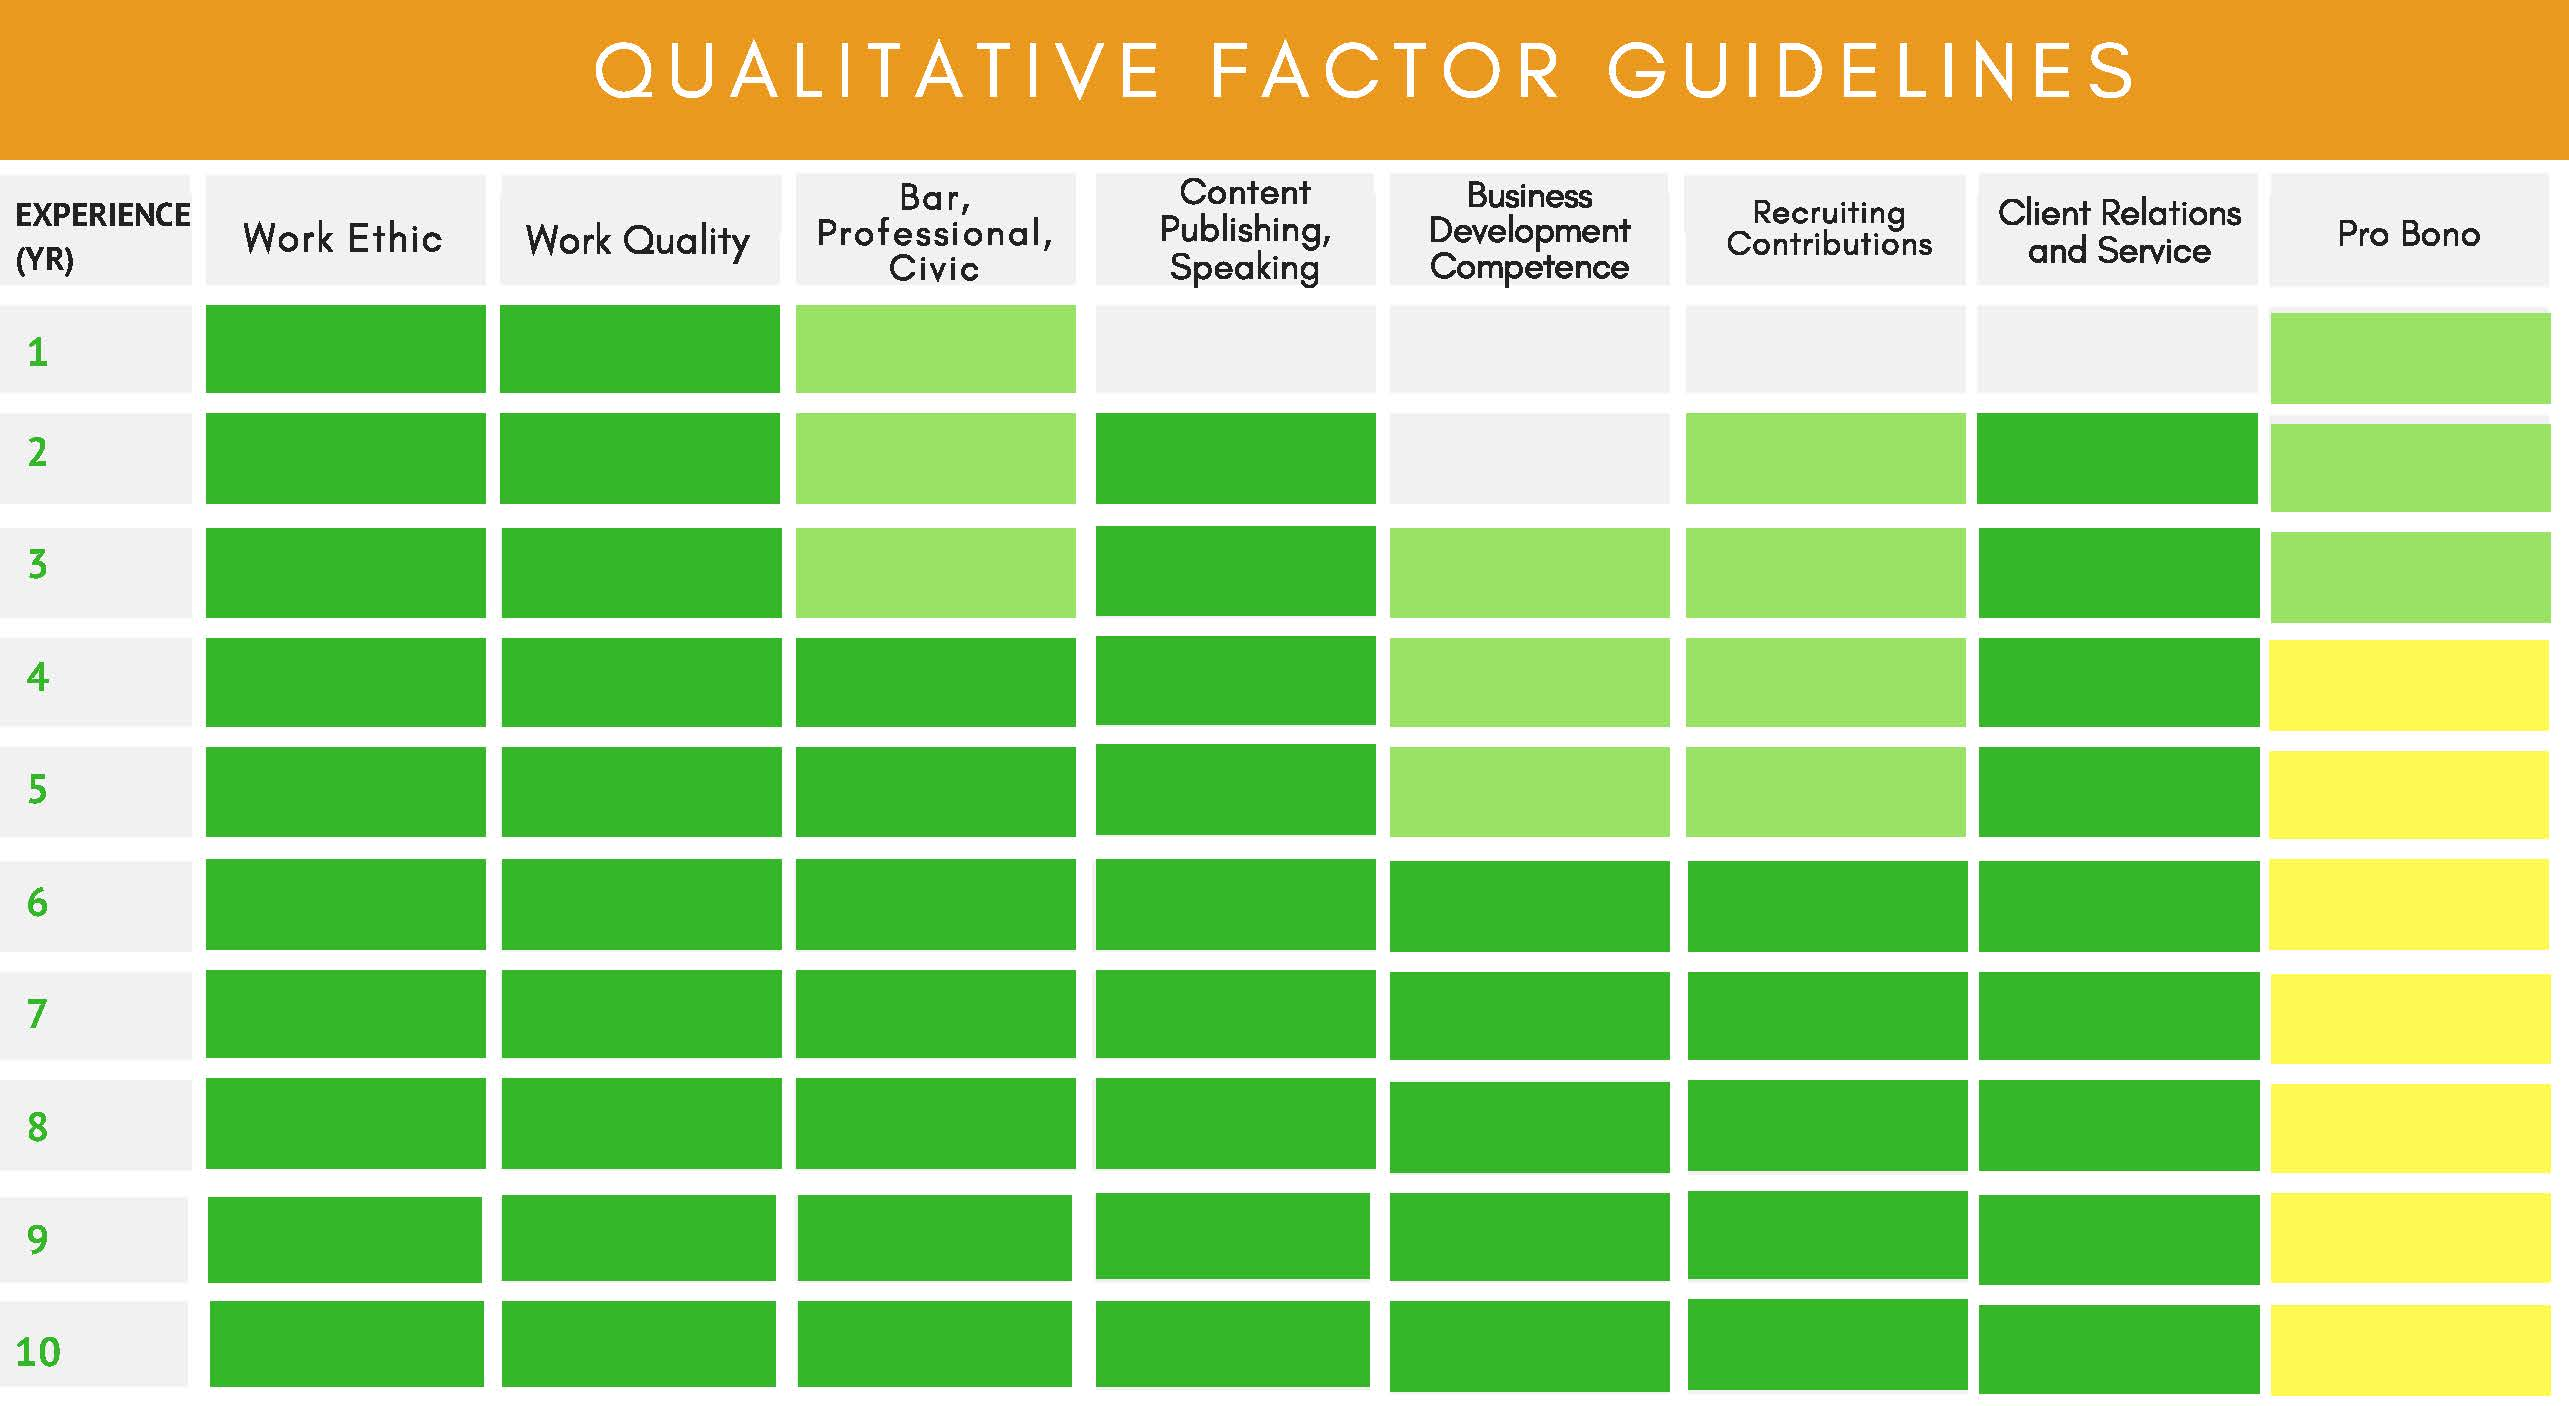 QualitativeFactorGuideline_.jpg